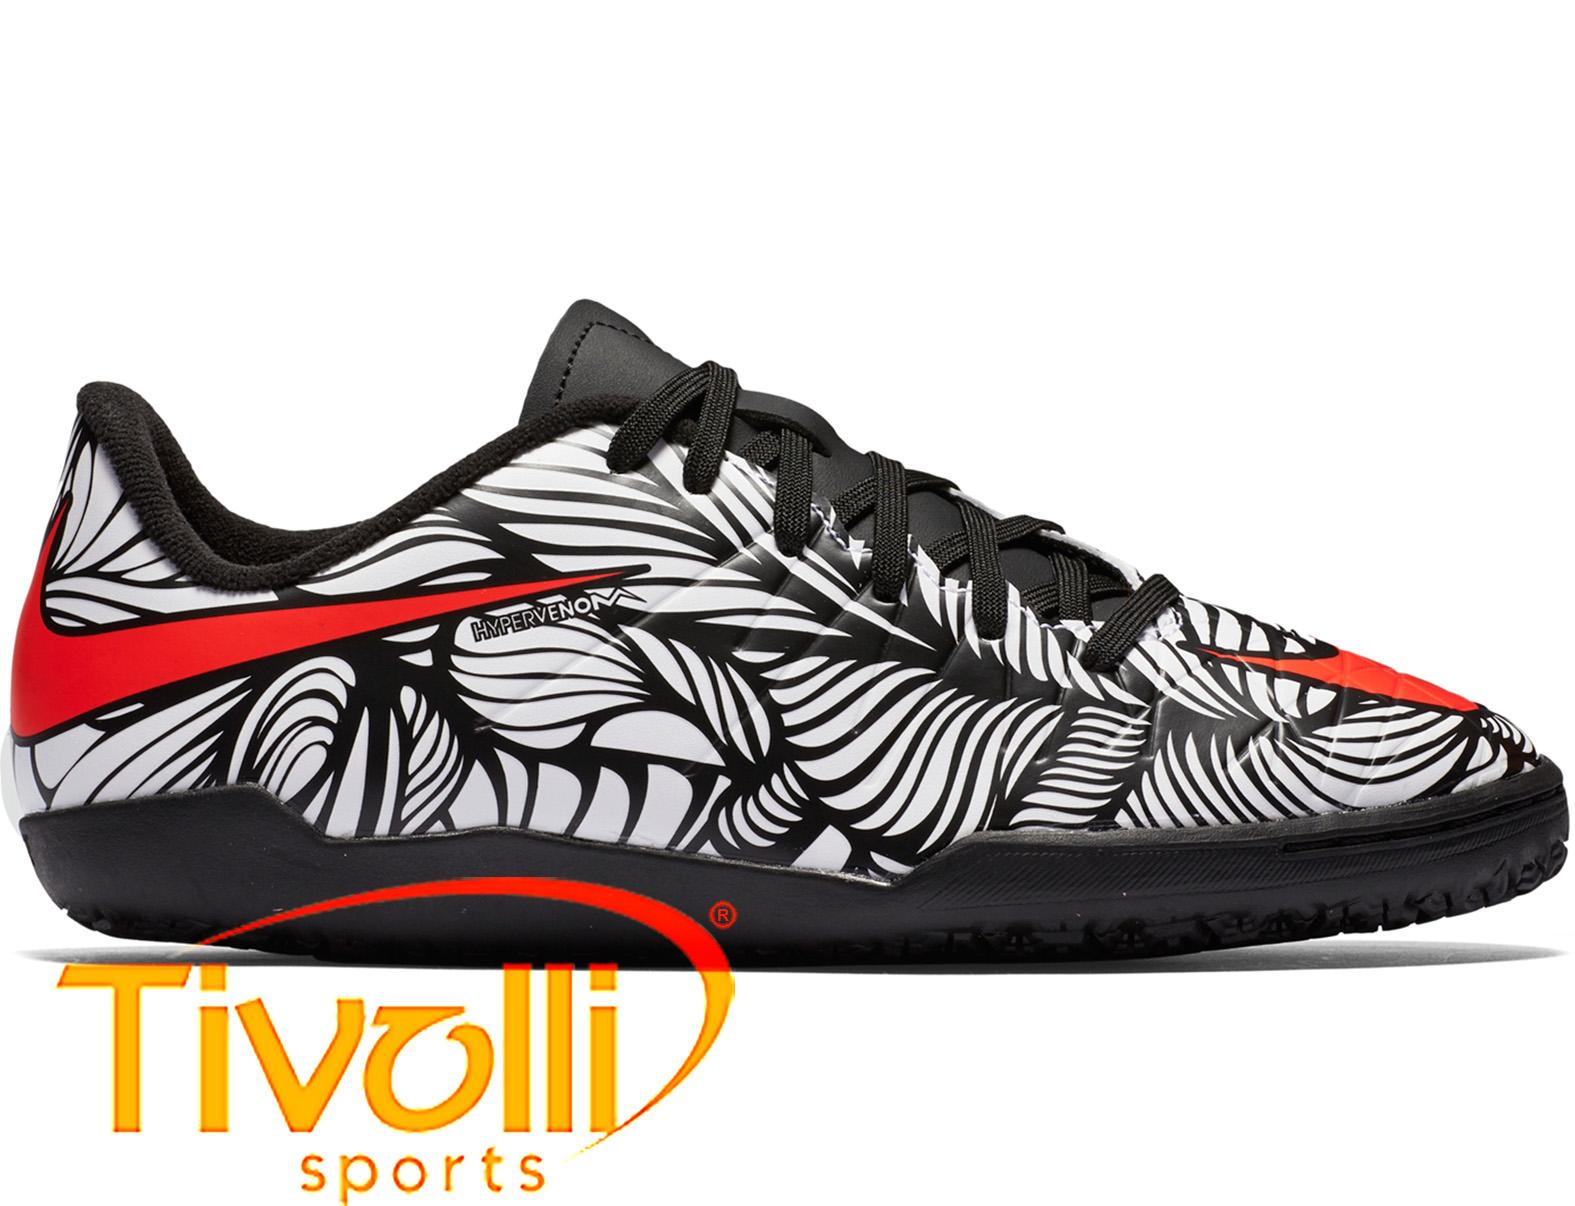 728de1ef8b Black Friday - Chuteira Nike Hypervenom Phade II IC infantil futsal Neymar  branca